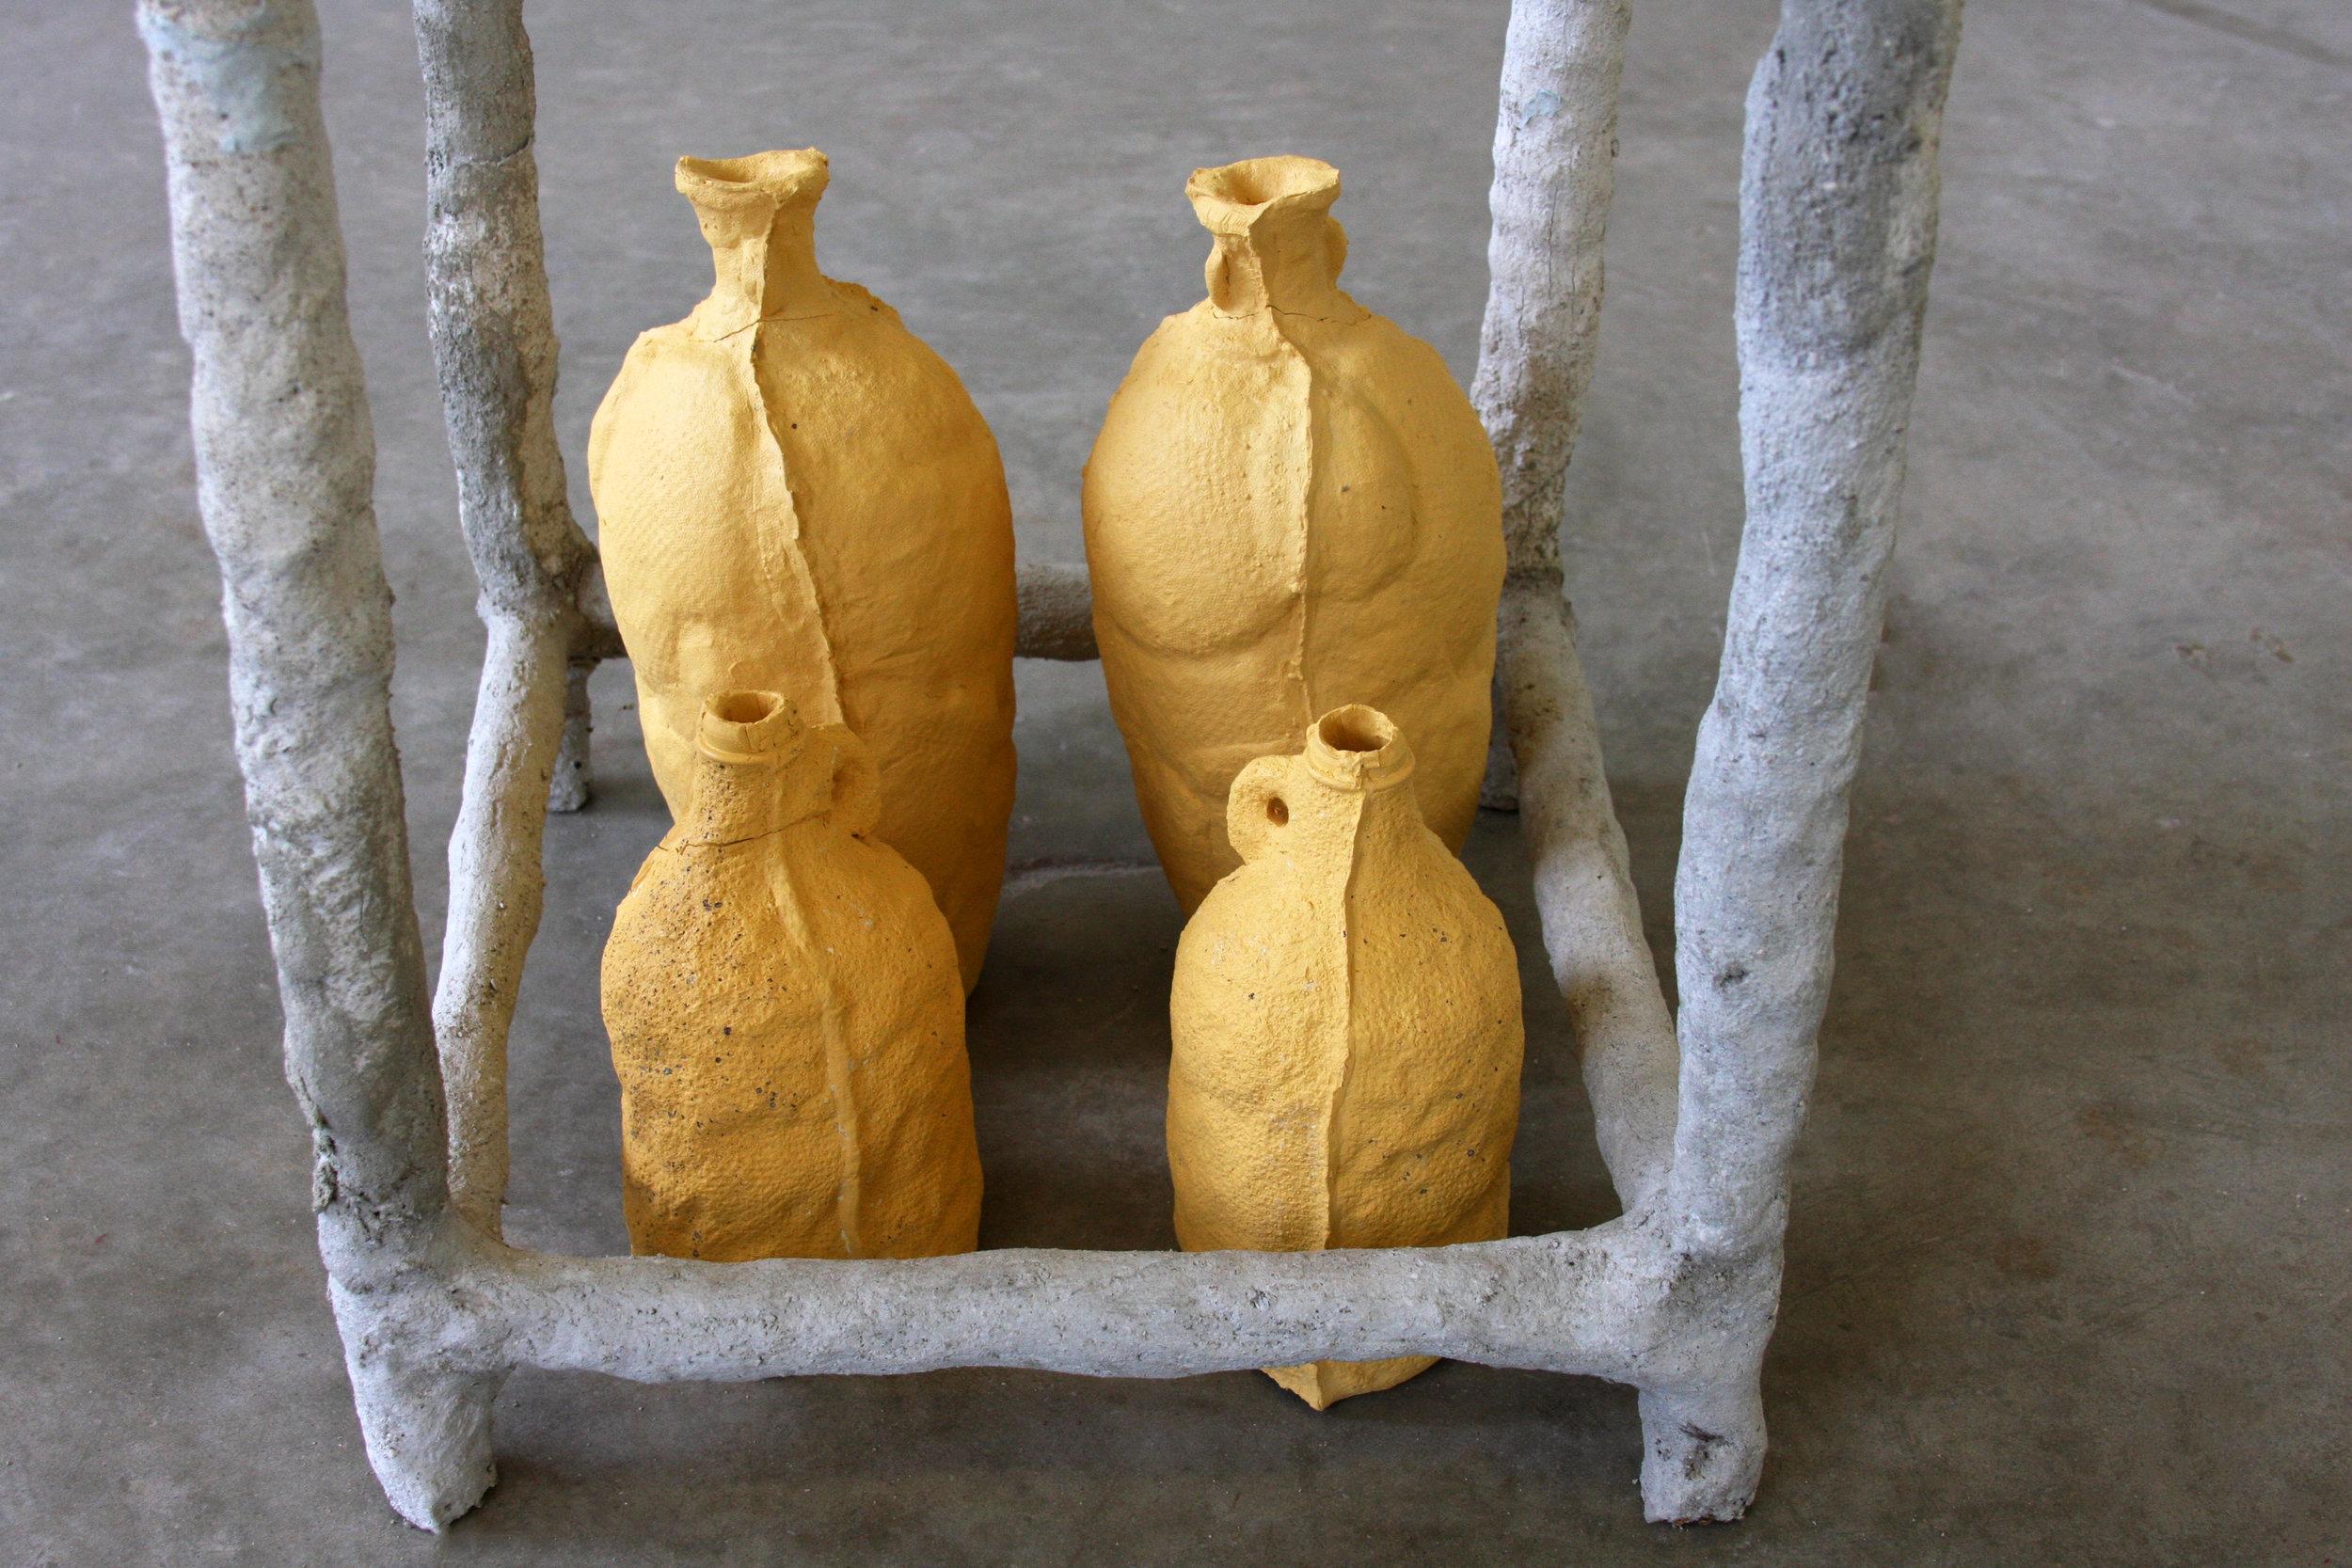 slip-cast dyed porcelain vessels